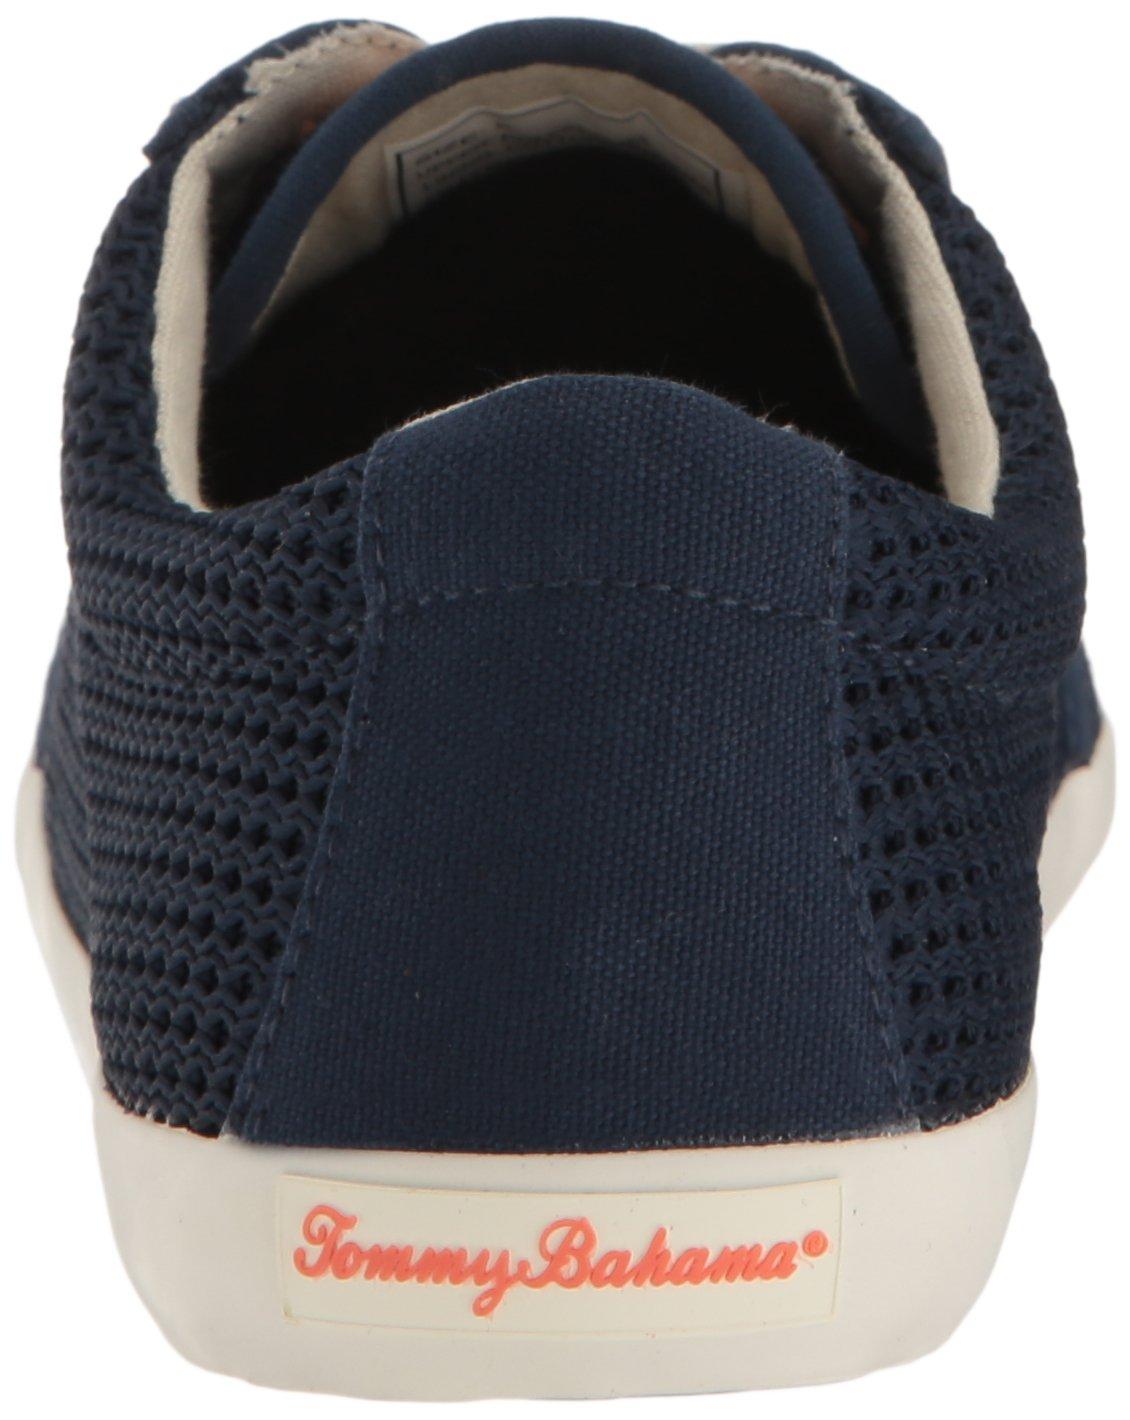 Tommy Bahama B01M1HLMD0 Women's Ettana Fashion Sneaker B01M1HLMD0 Bahama 8.5 B(M) US|Navy 2742df